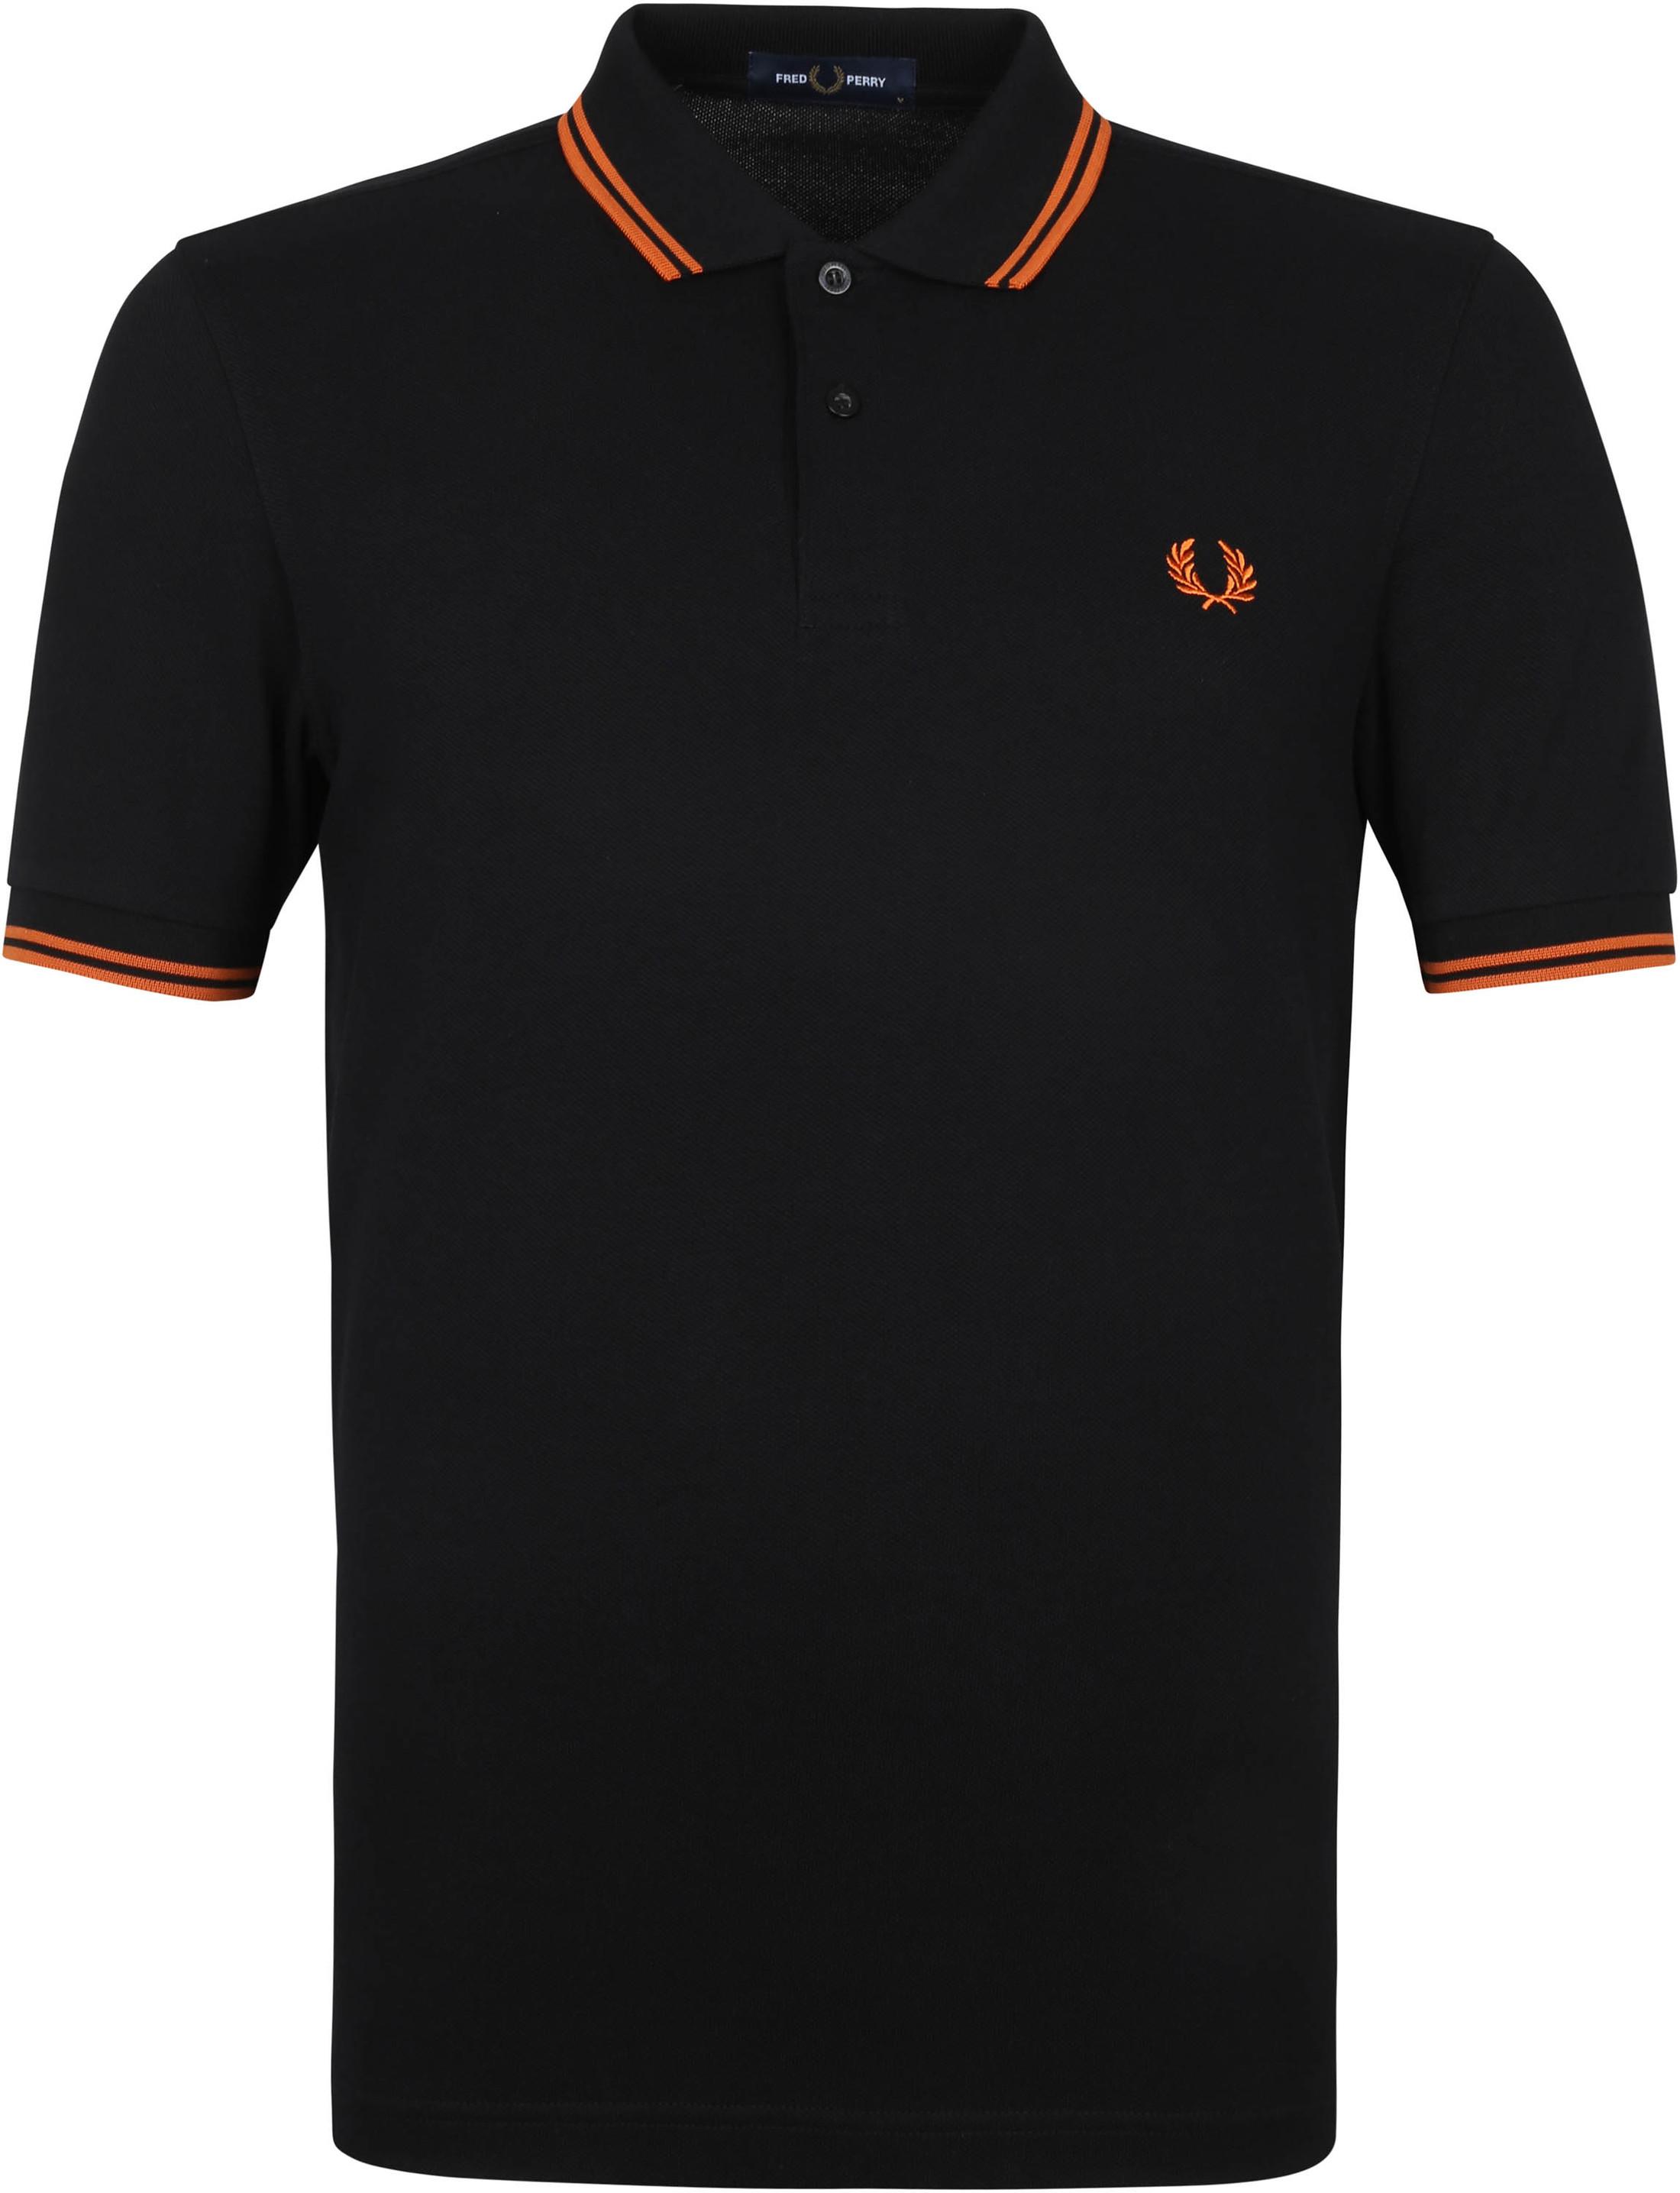 Fred Perry Poloshirt M3600 Schwarz Orange